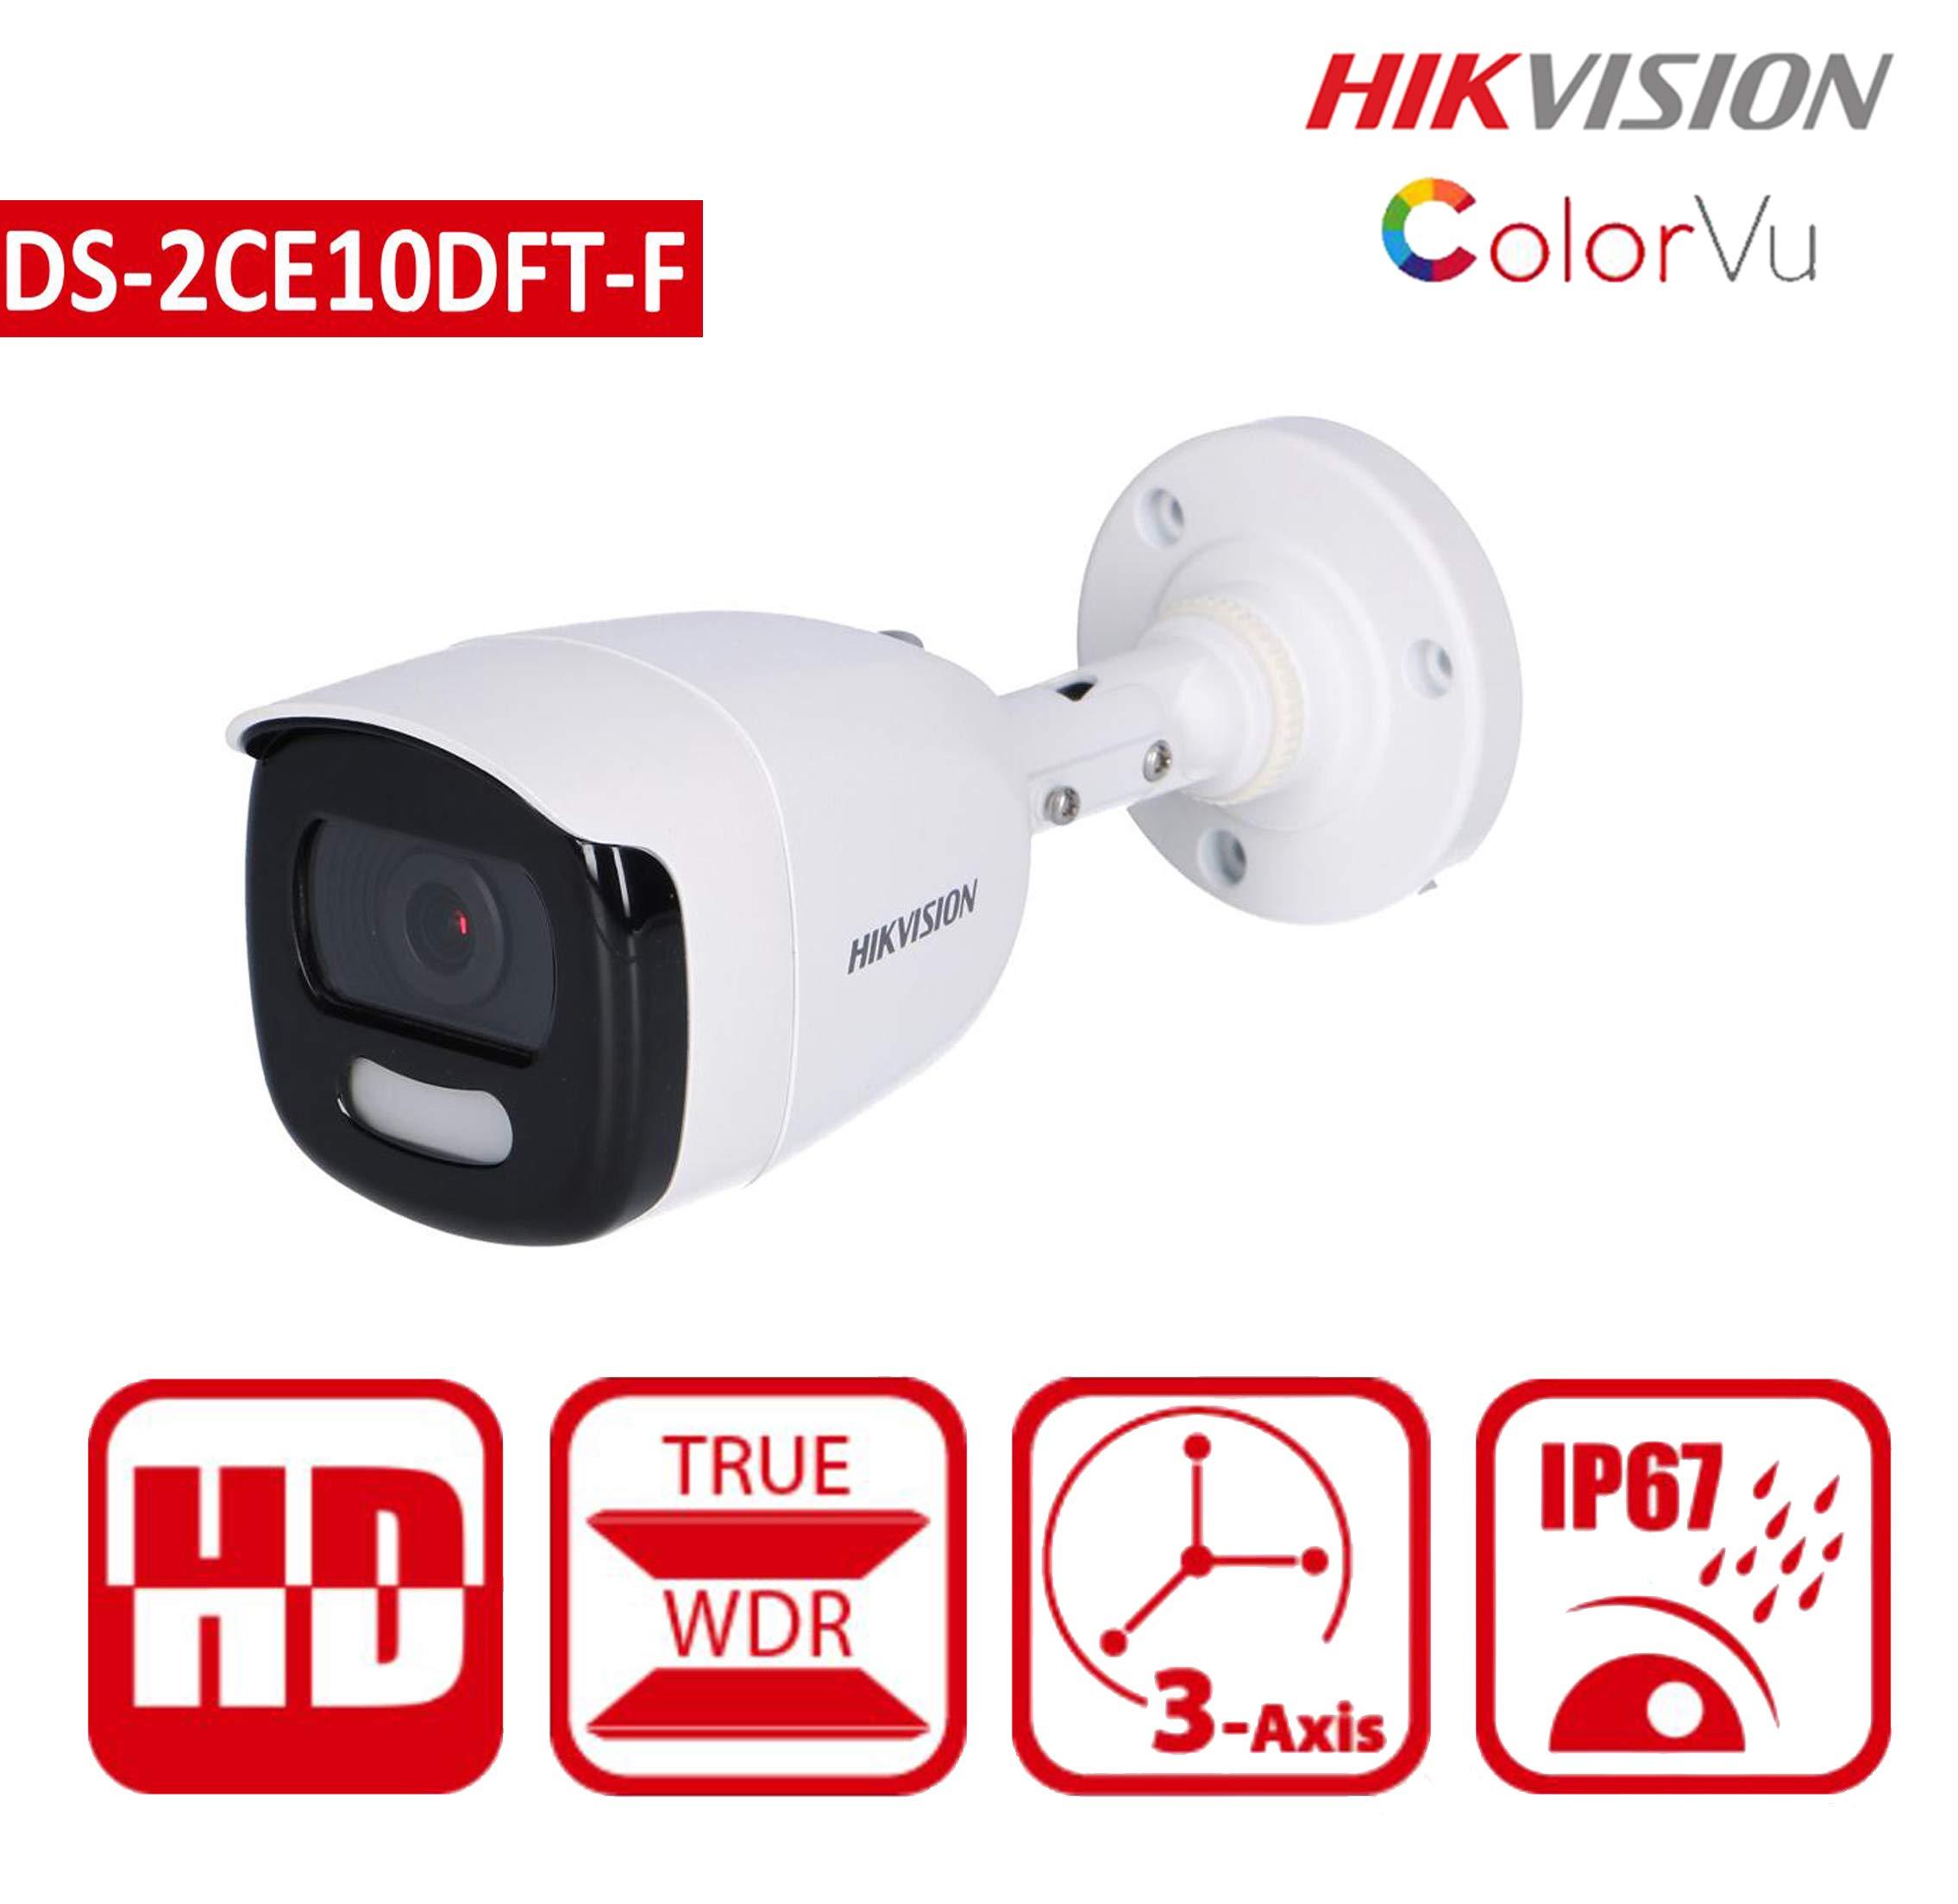 HIKVISION 2 MP Night ColorVu IR Full HD Bullet Night Vision Camera- 1080P (B07ZMBNWJC) Amazon Price History, Amazon Price Tracker